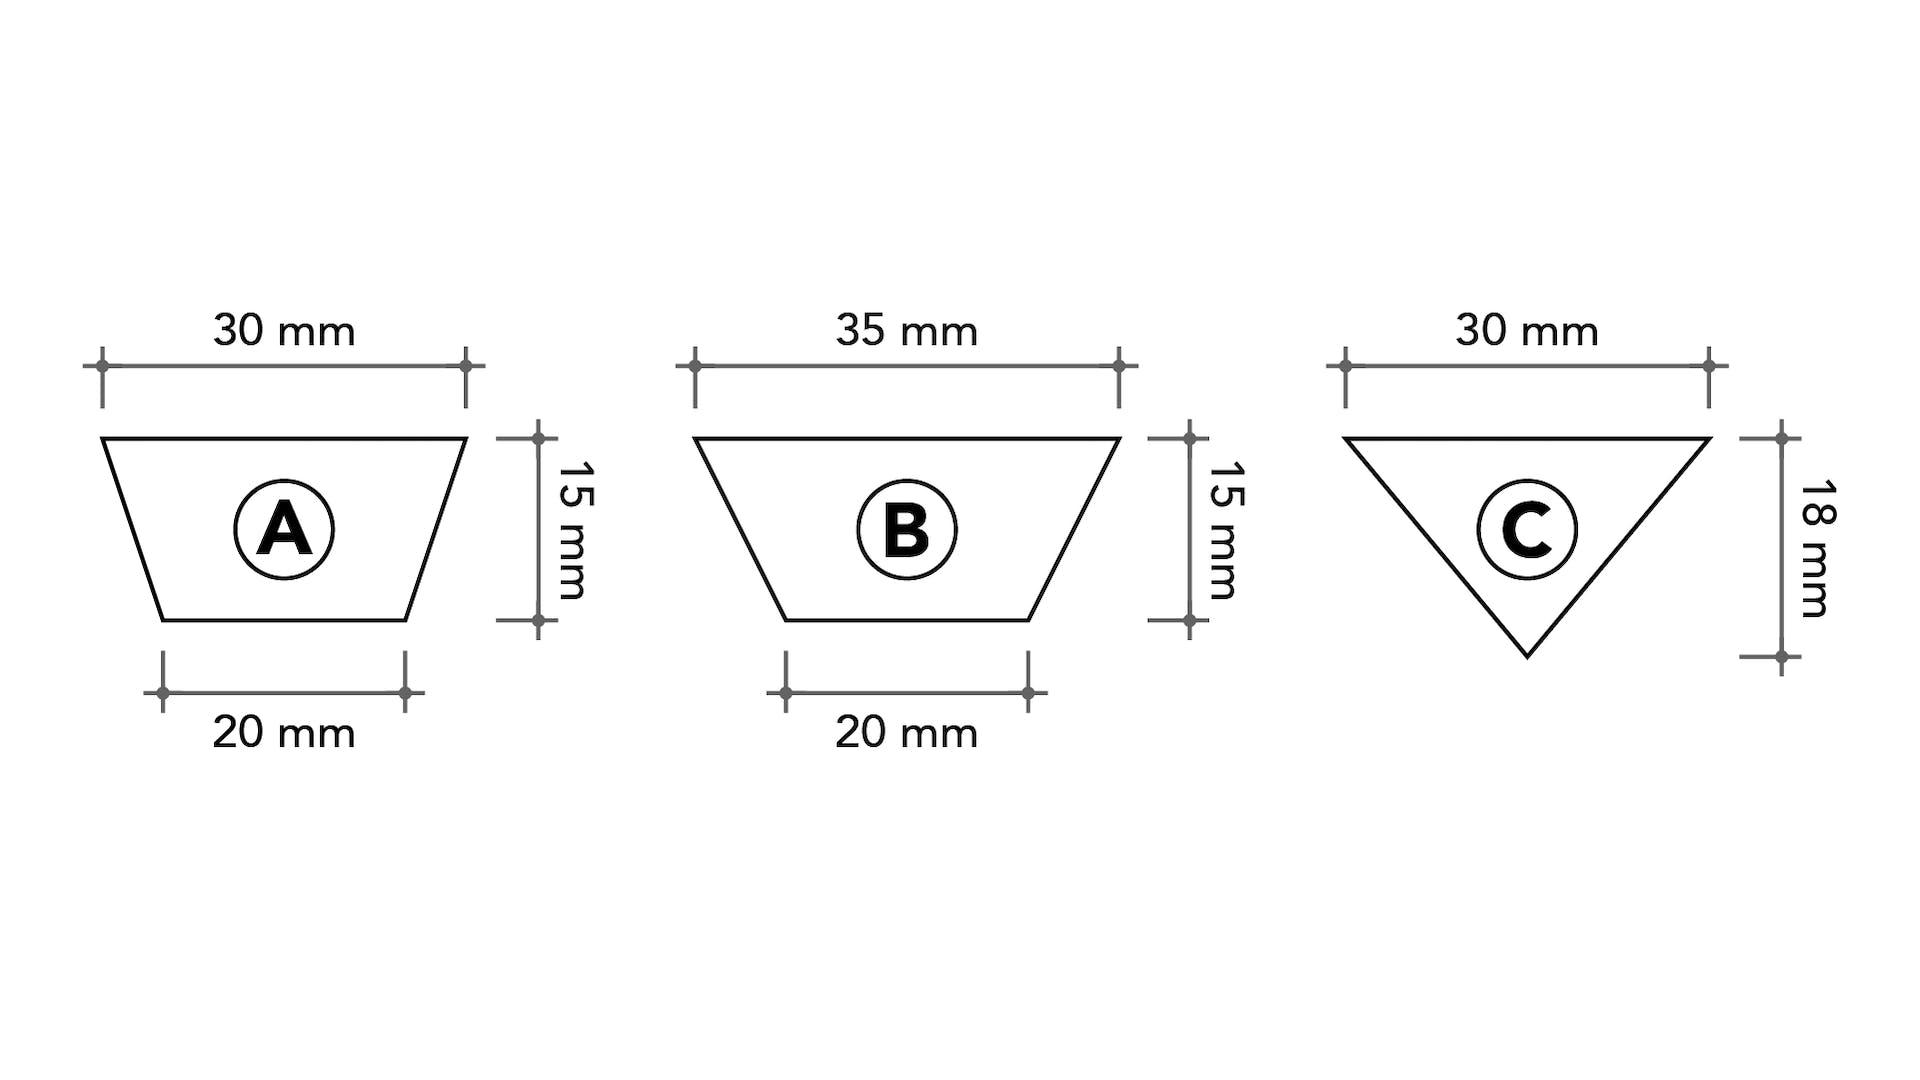 Coverrock Deko, ETICS, dimensions milling slot, germany